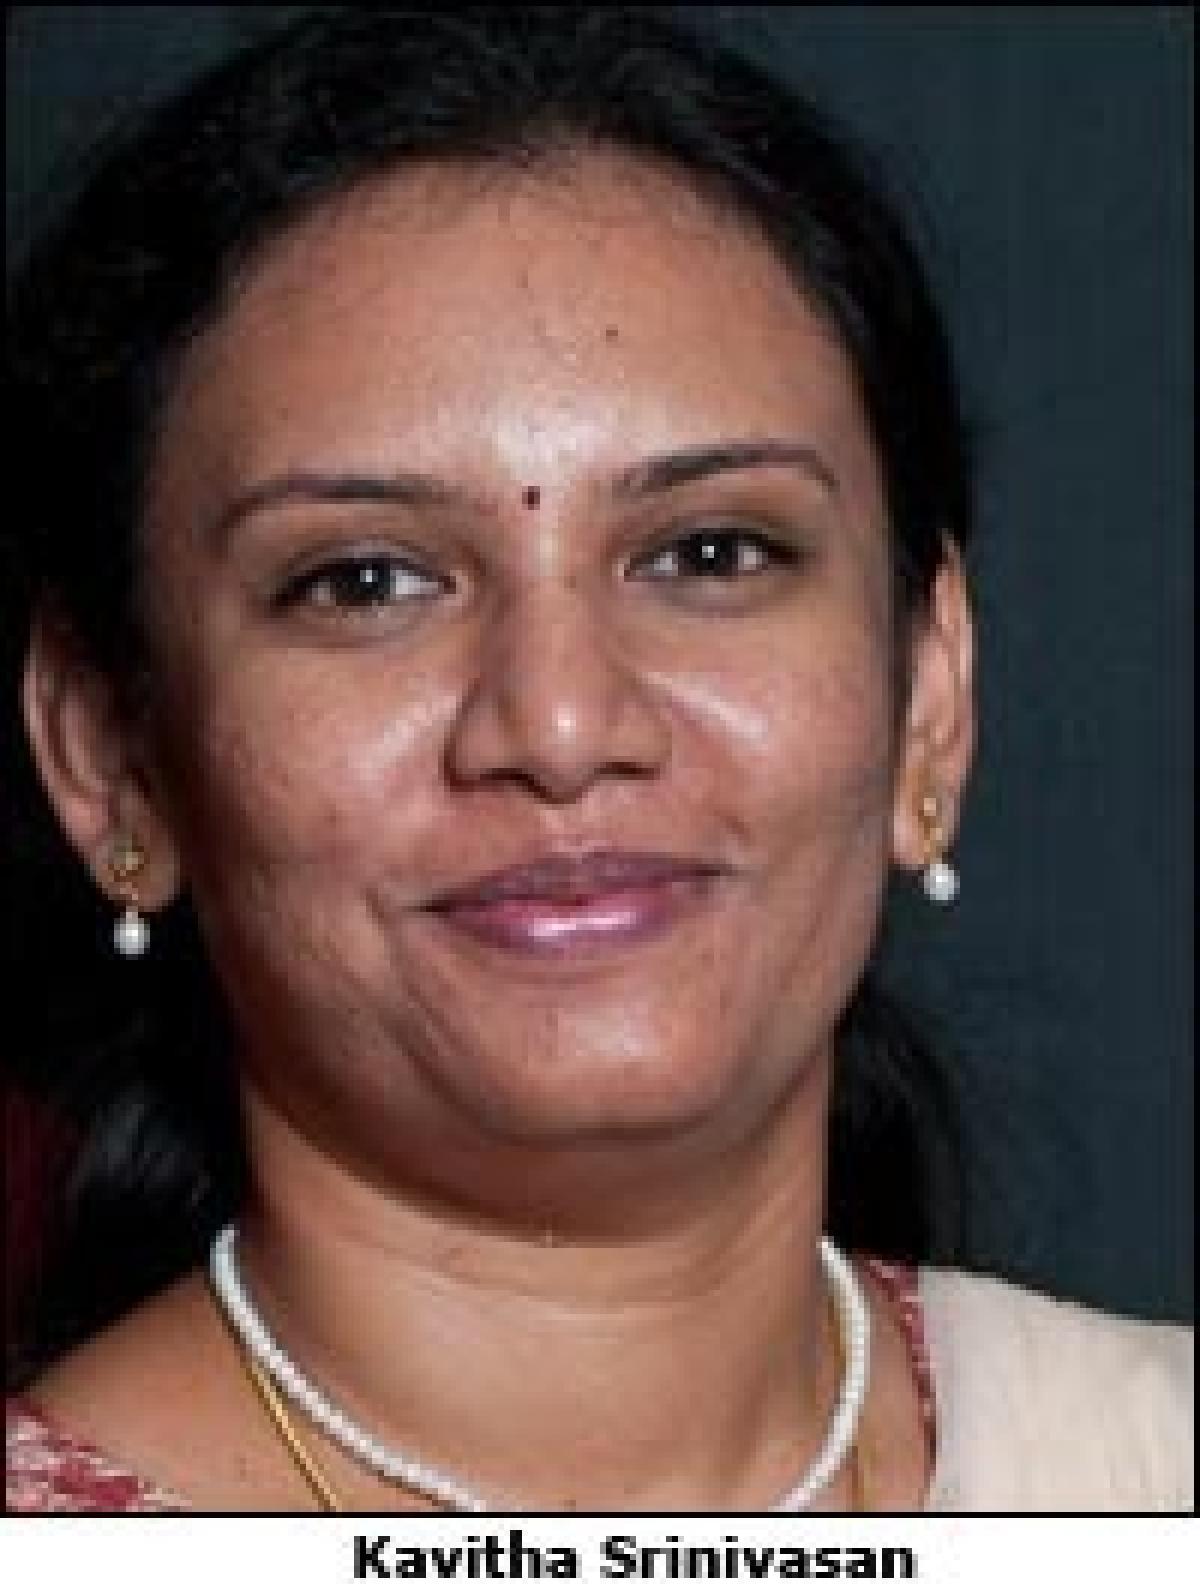 Tamil Nadu GECs witness 17 per cent drop in viewership in February